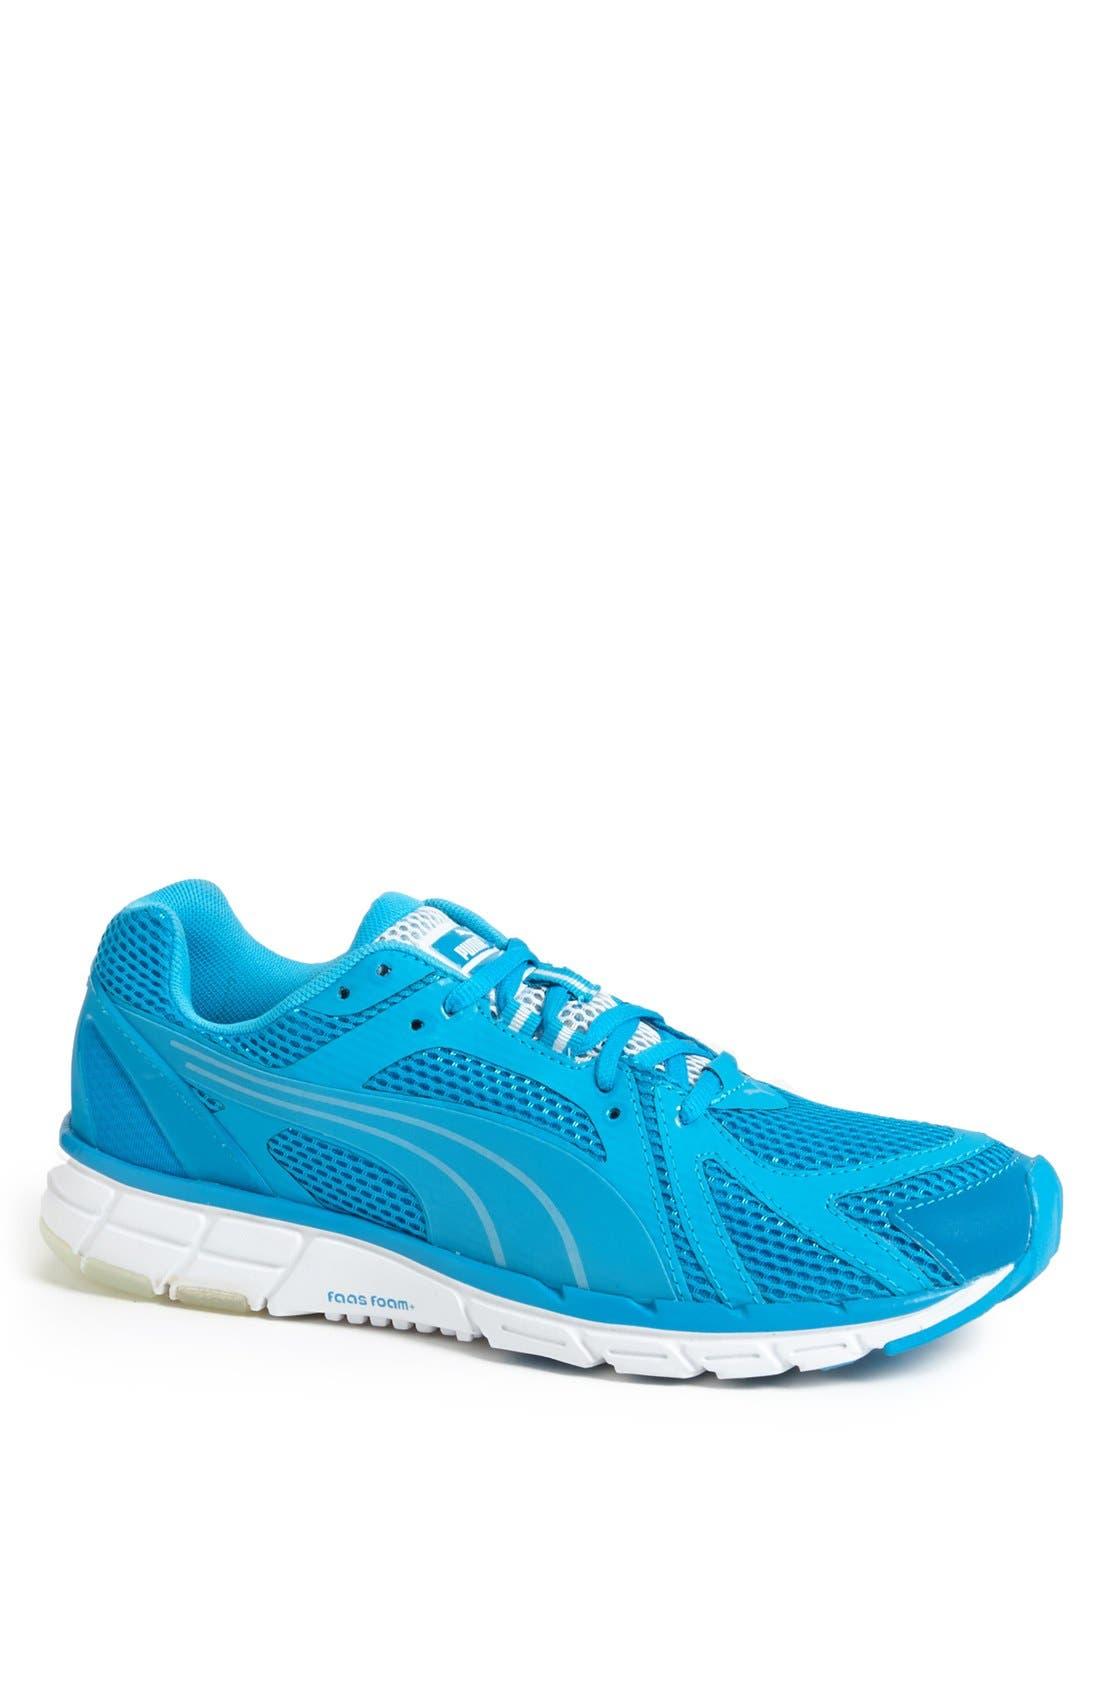 Alternate Image 1 Selected - PUMA 'Faas 600 S Glow' Running Shoe (Men)